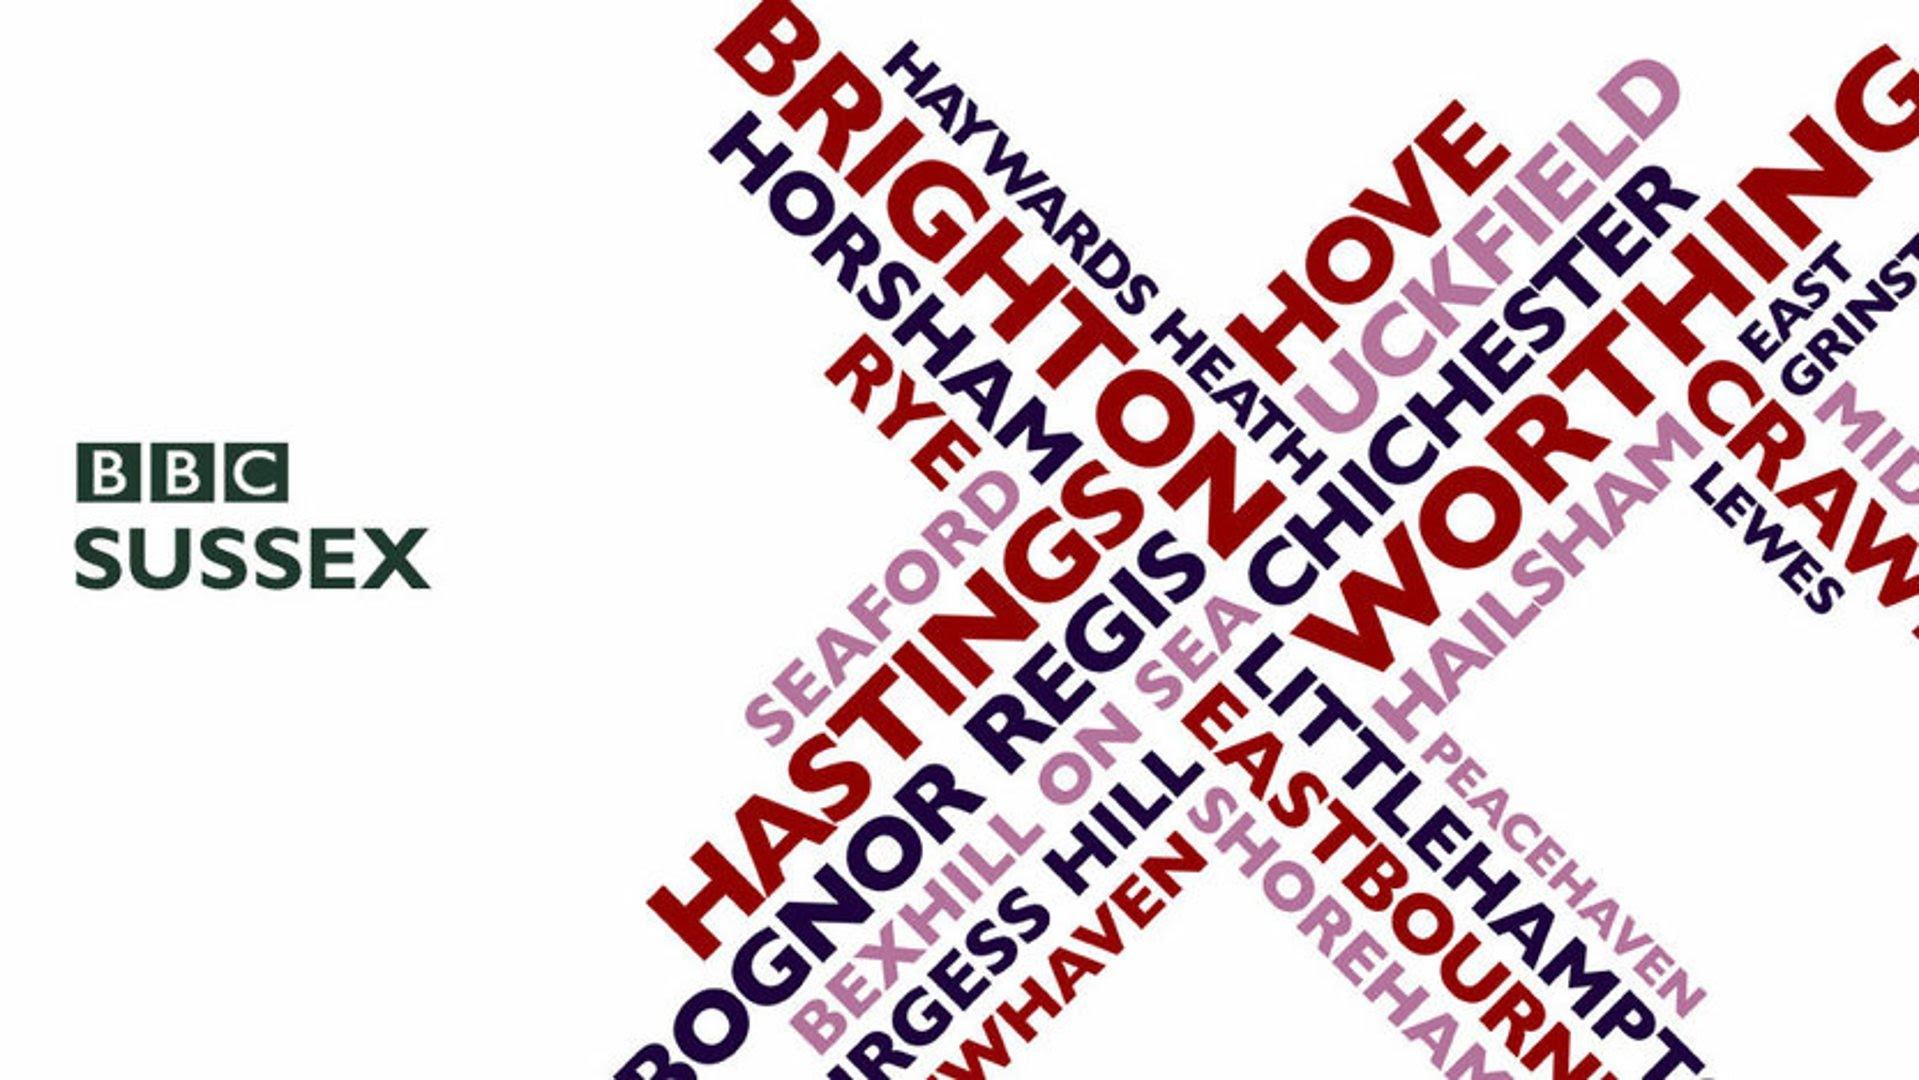 INTERVIEW WITH BBC RADIO SUSSEX